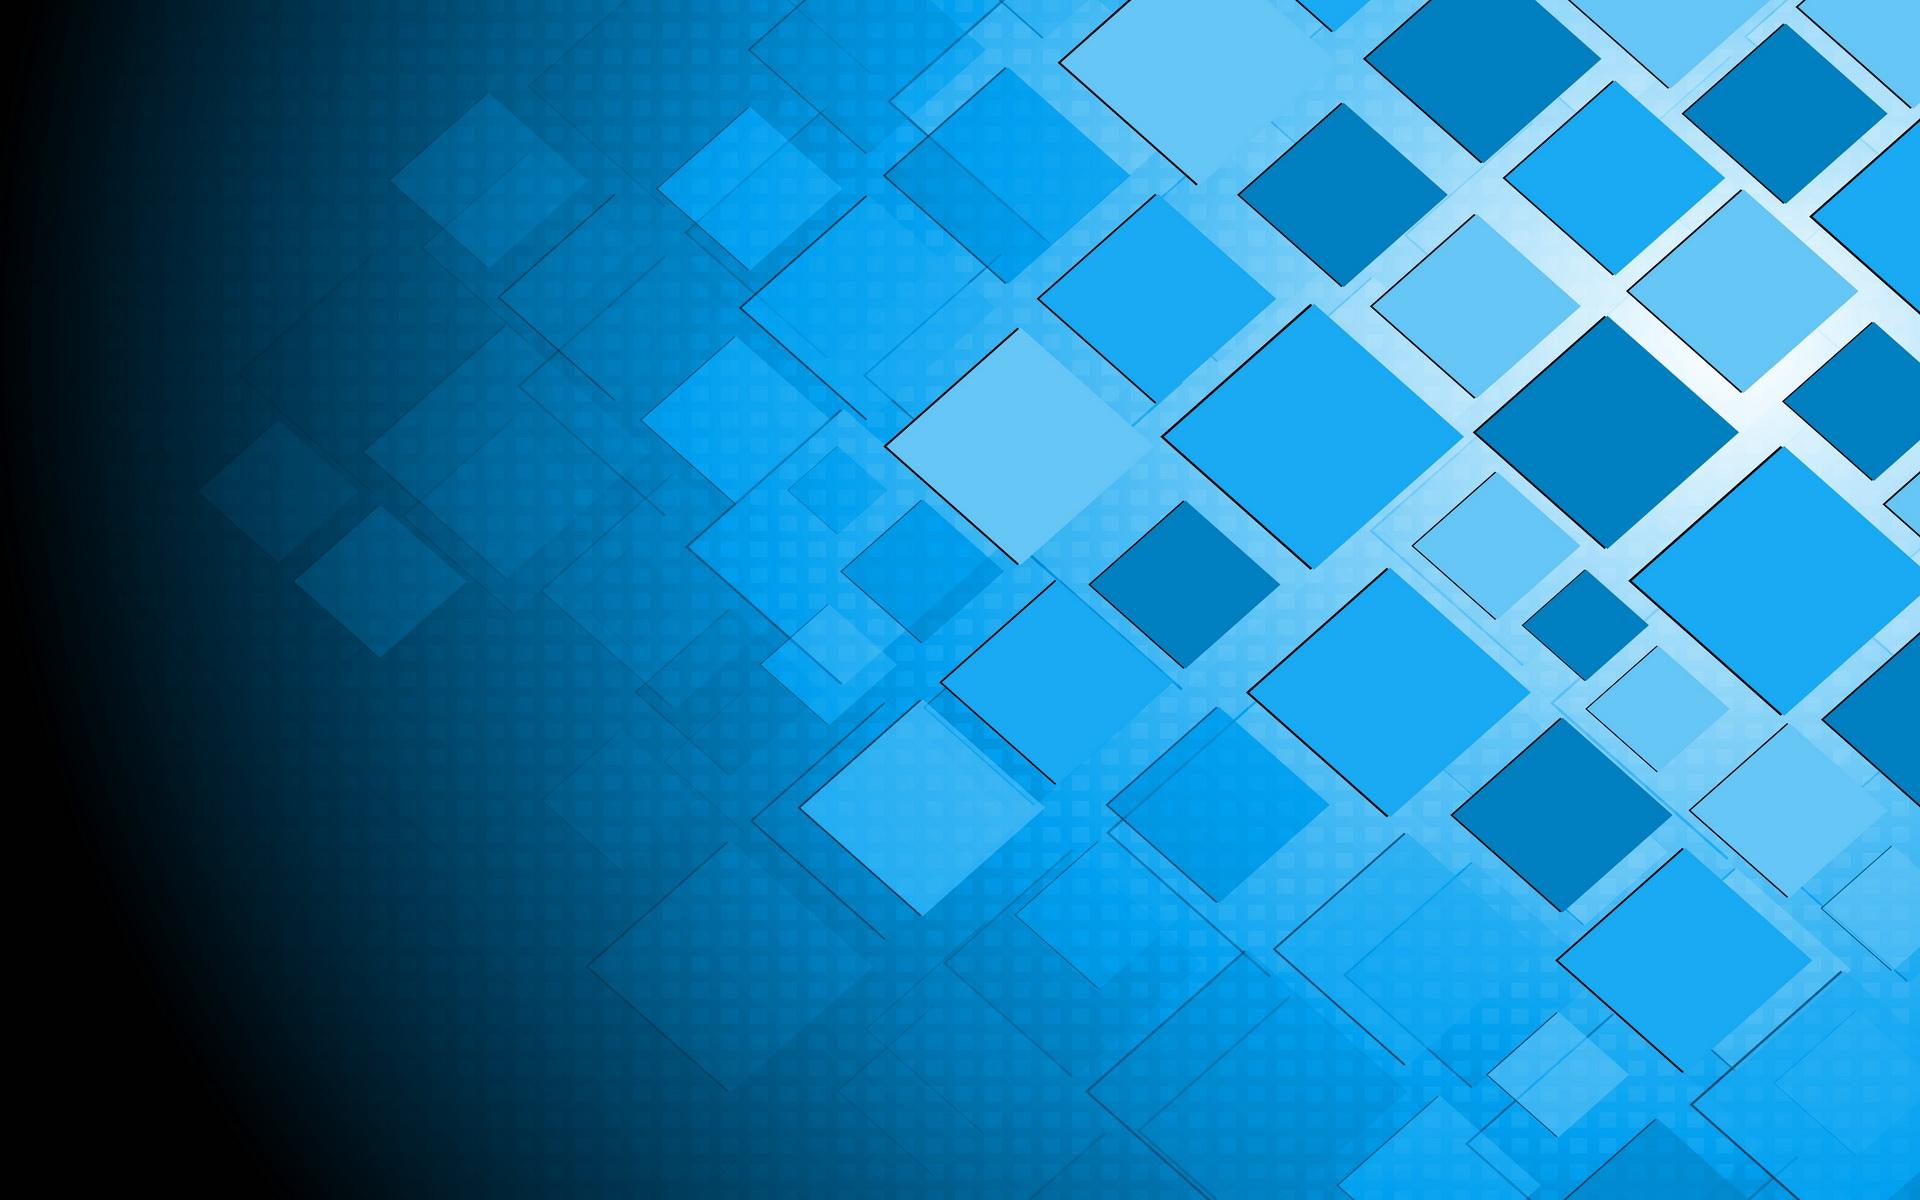 cube computer wallpapers desktop - photo #1